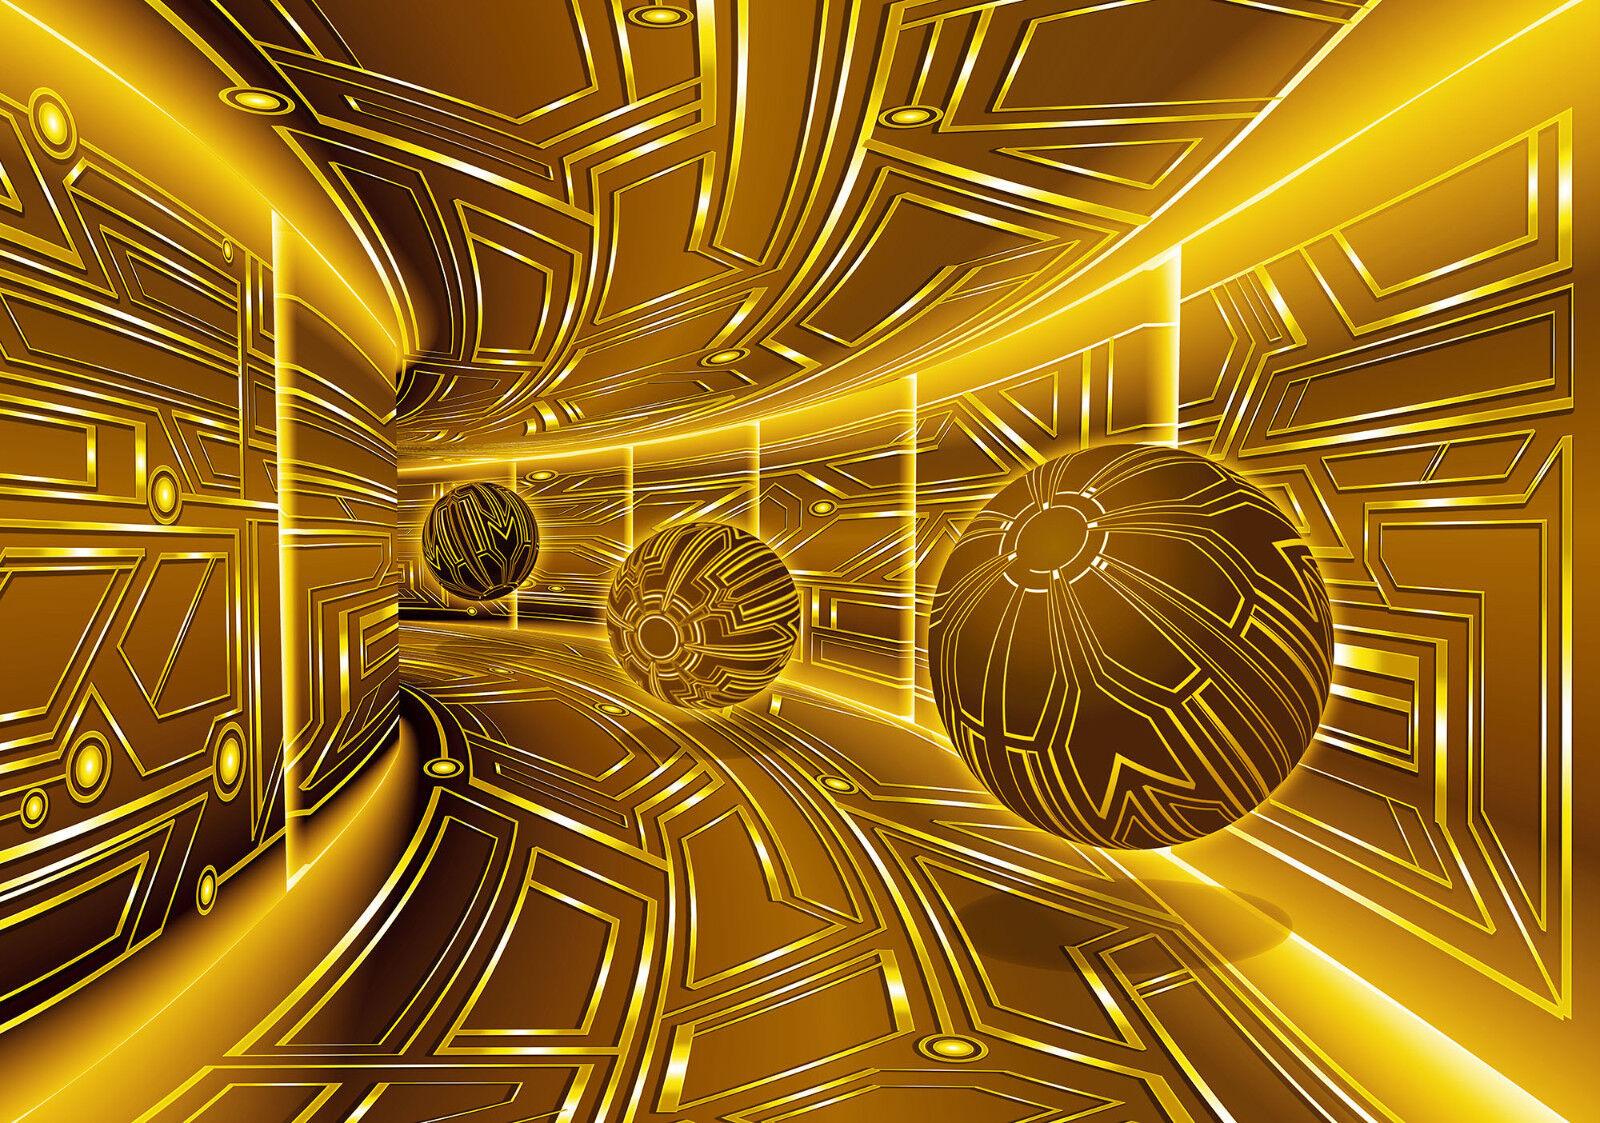 VLIES Fototapete-3D MUSTER-(10081)-Design Abstrakt Tunnel Optik Kugeln Deco xxl